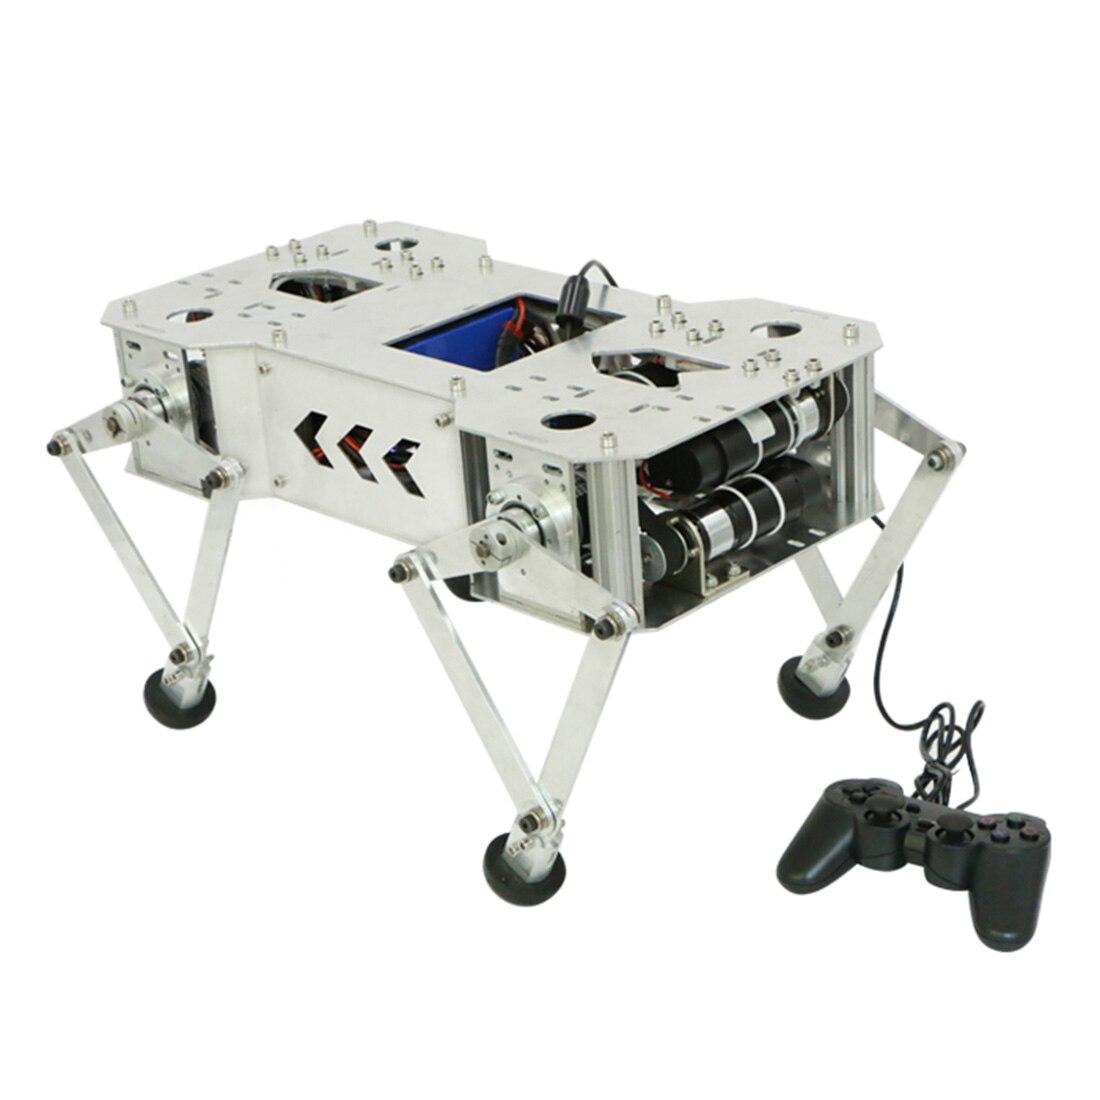 Programmable Metal Mechanical Dog Bionic Quadruped Crawling Robot Toy